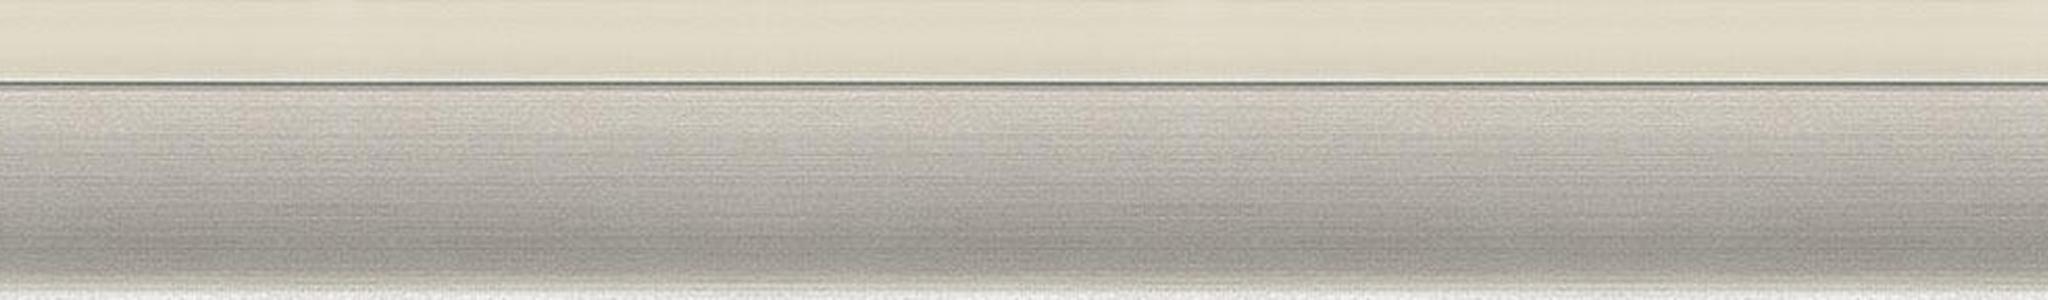 HD 29235 Акрил 3D кромка сталь-кашемир